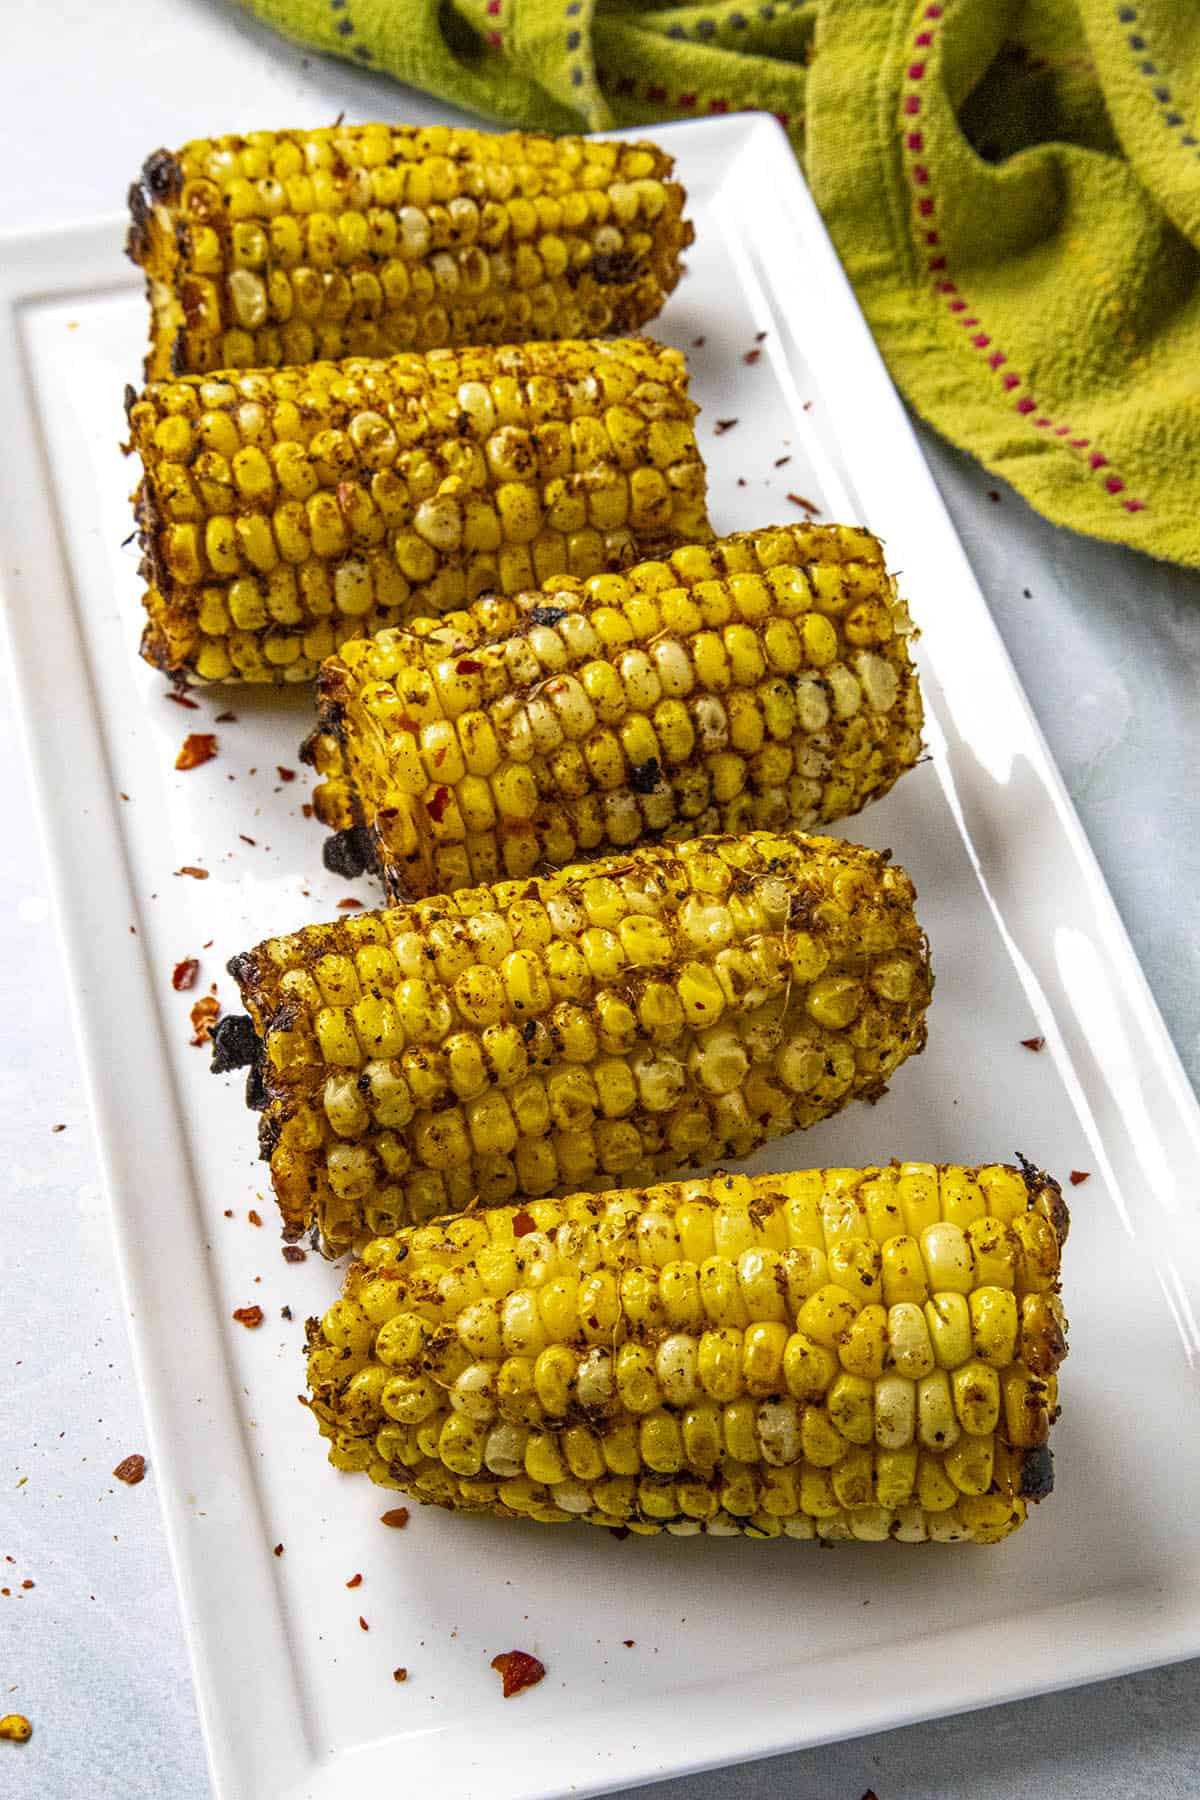 Grilled corn on the cob with plenty of jerk seasonings